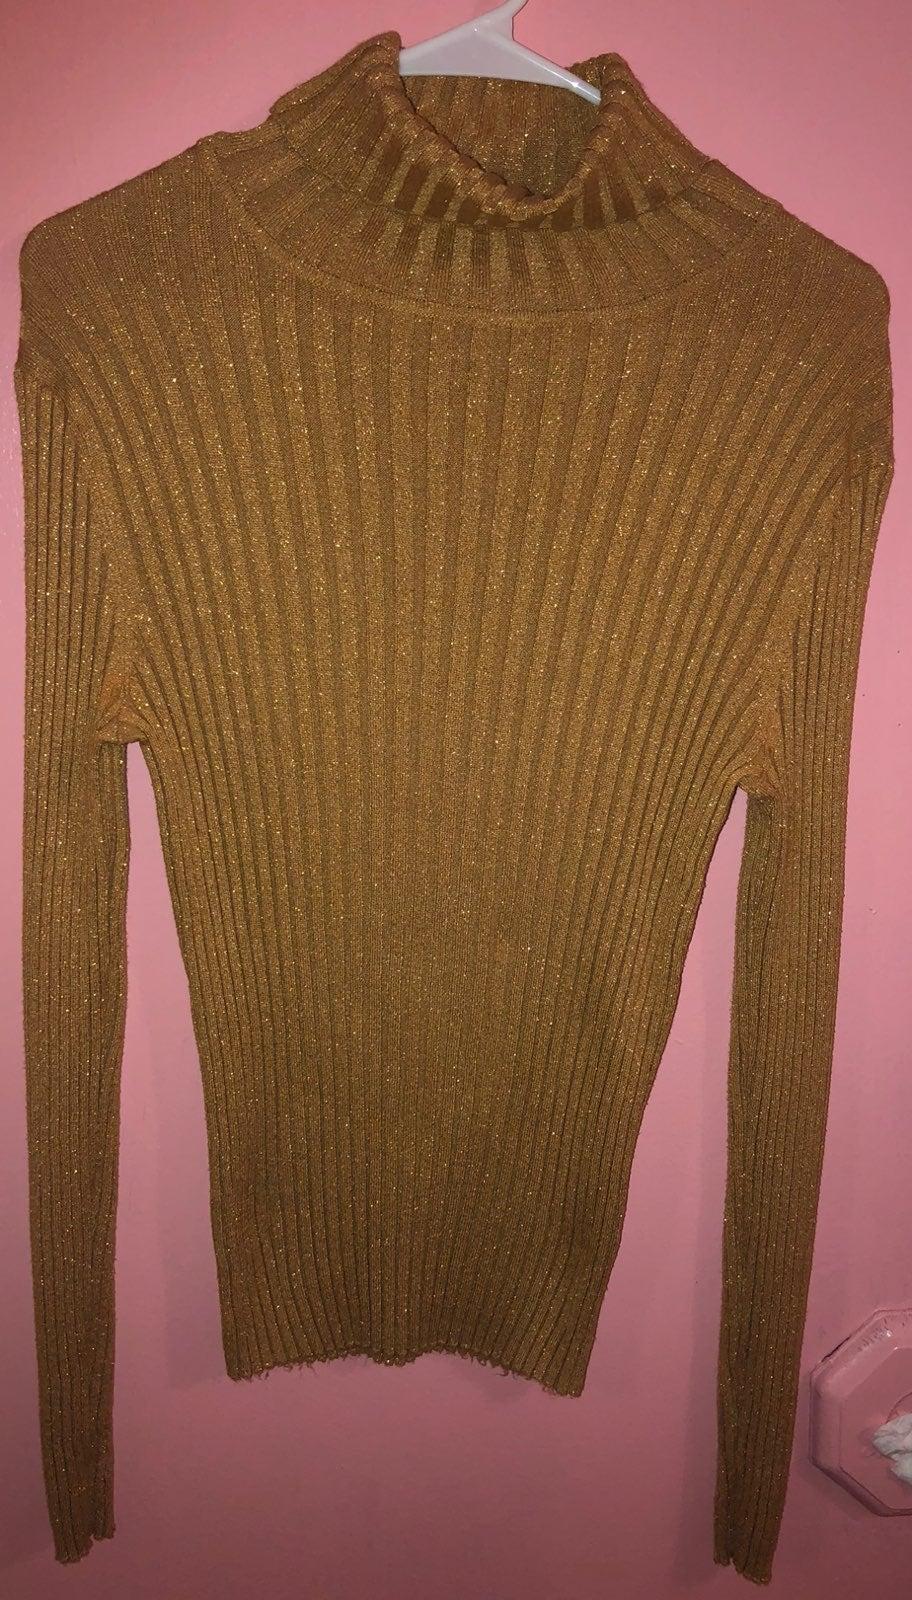 Turtleneck gold sweater